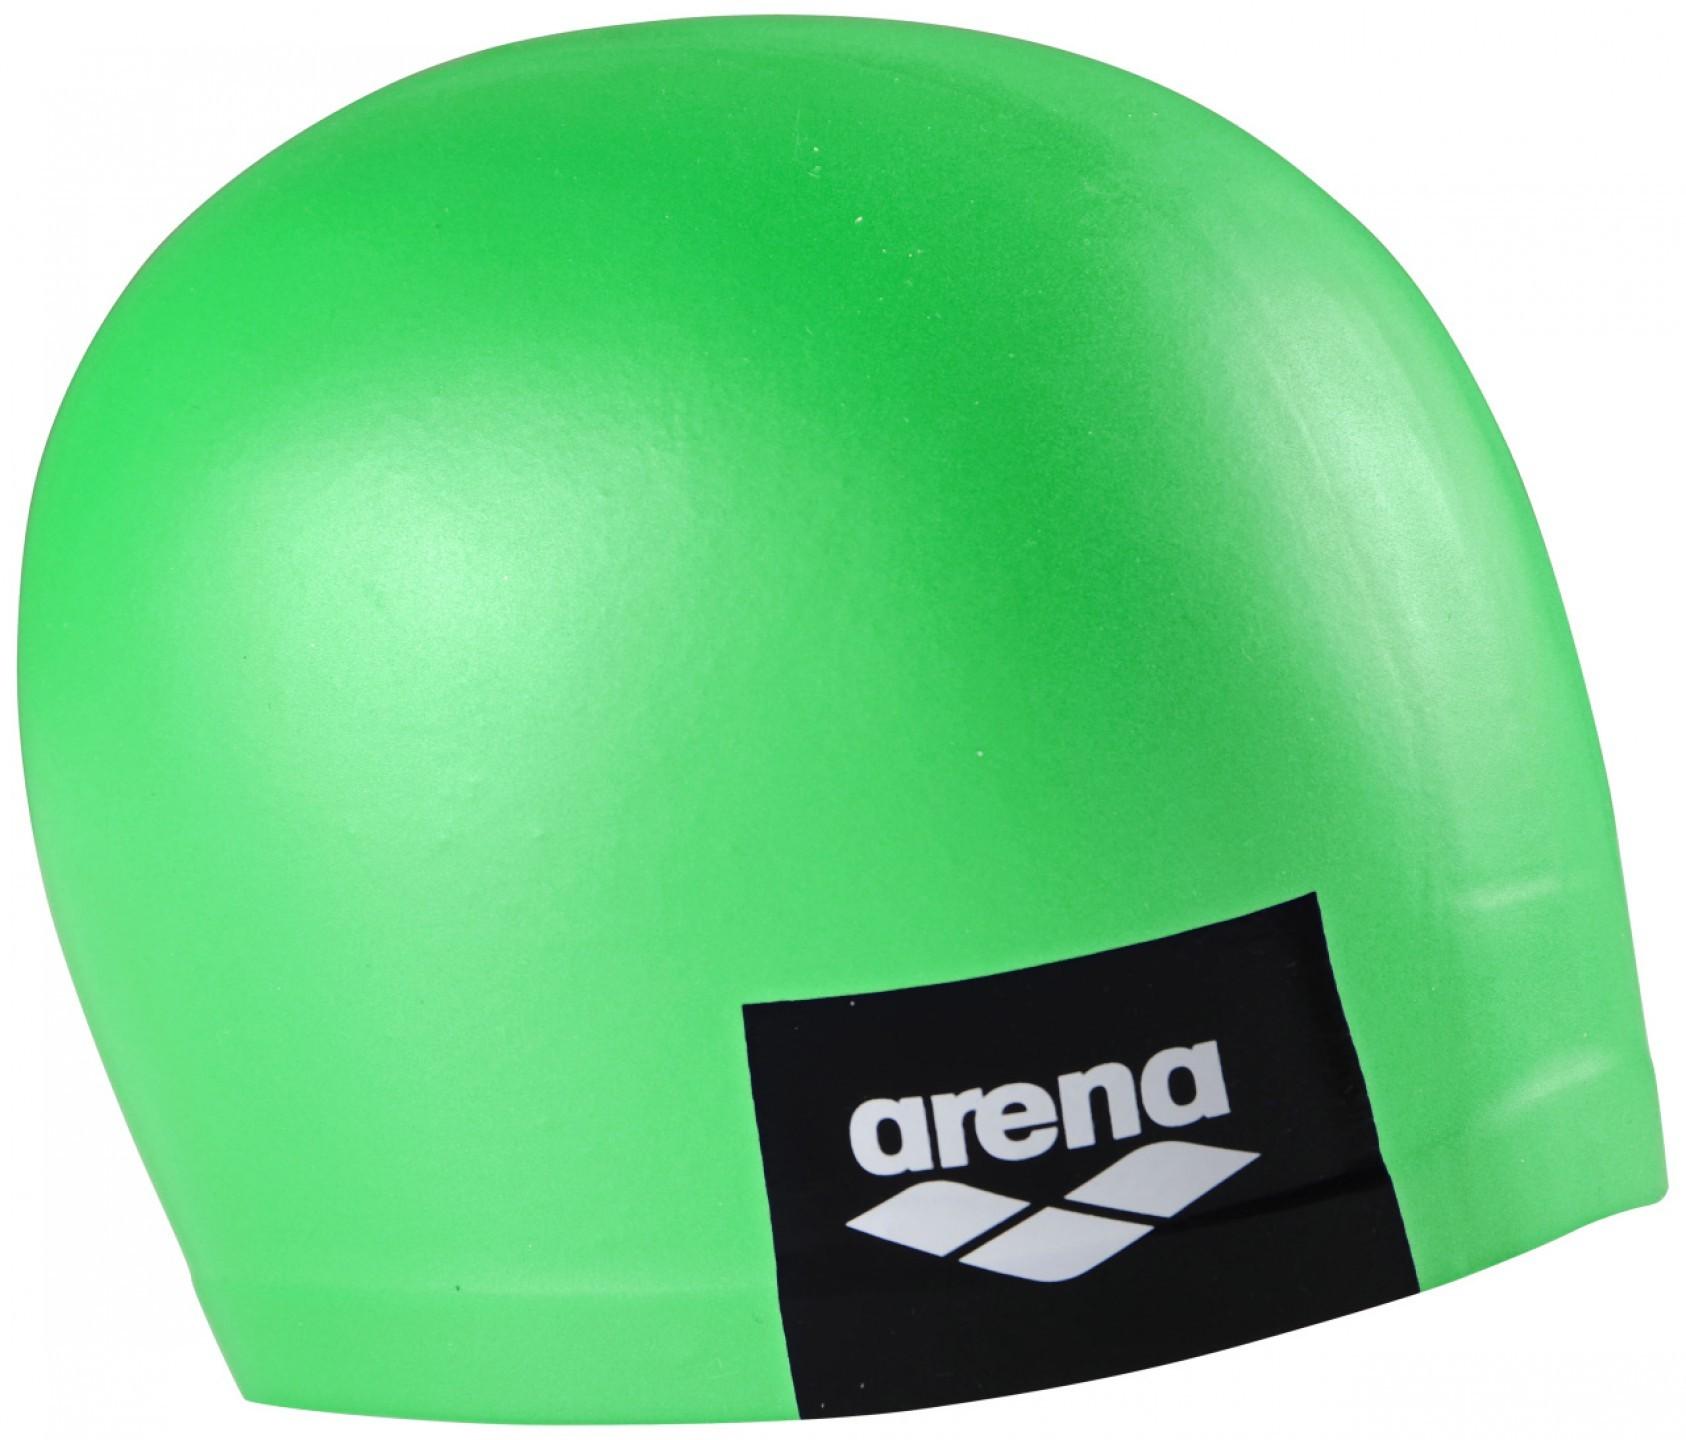 Arena badmuts logo moulded pea-green